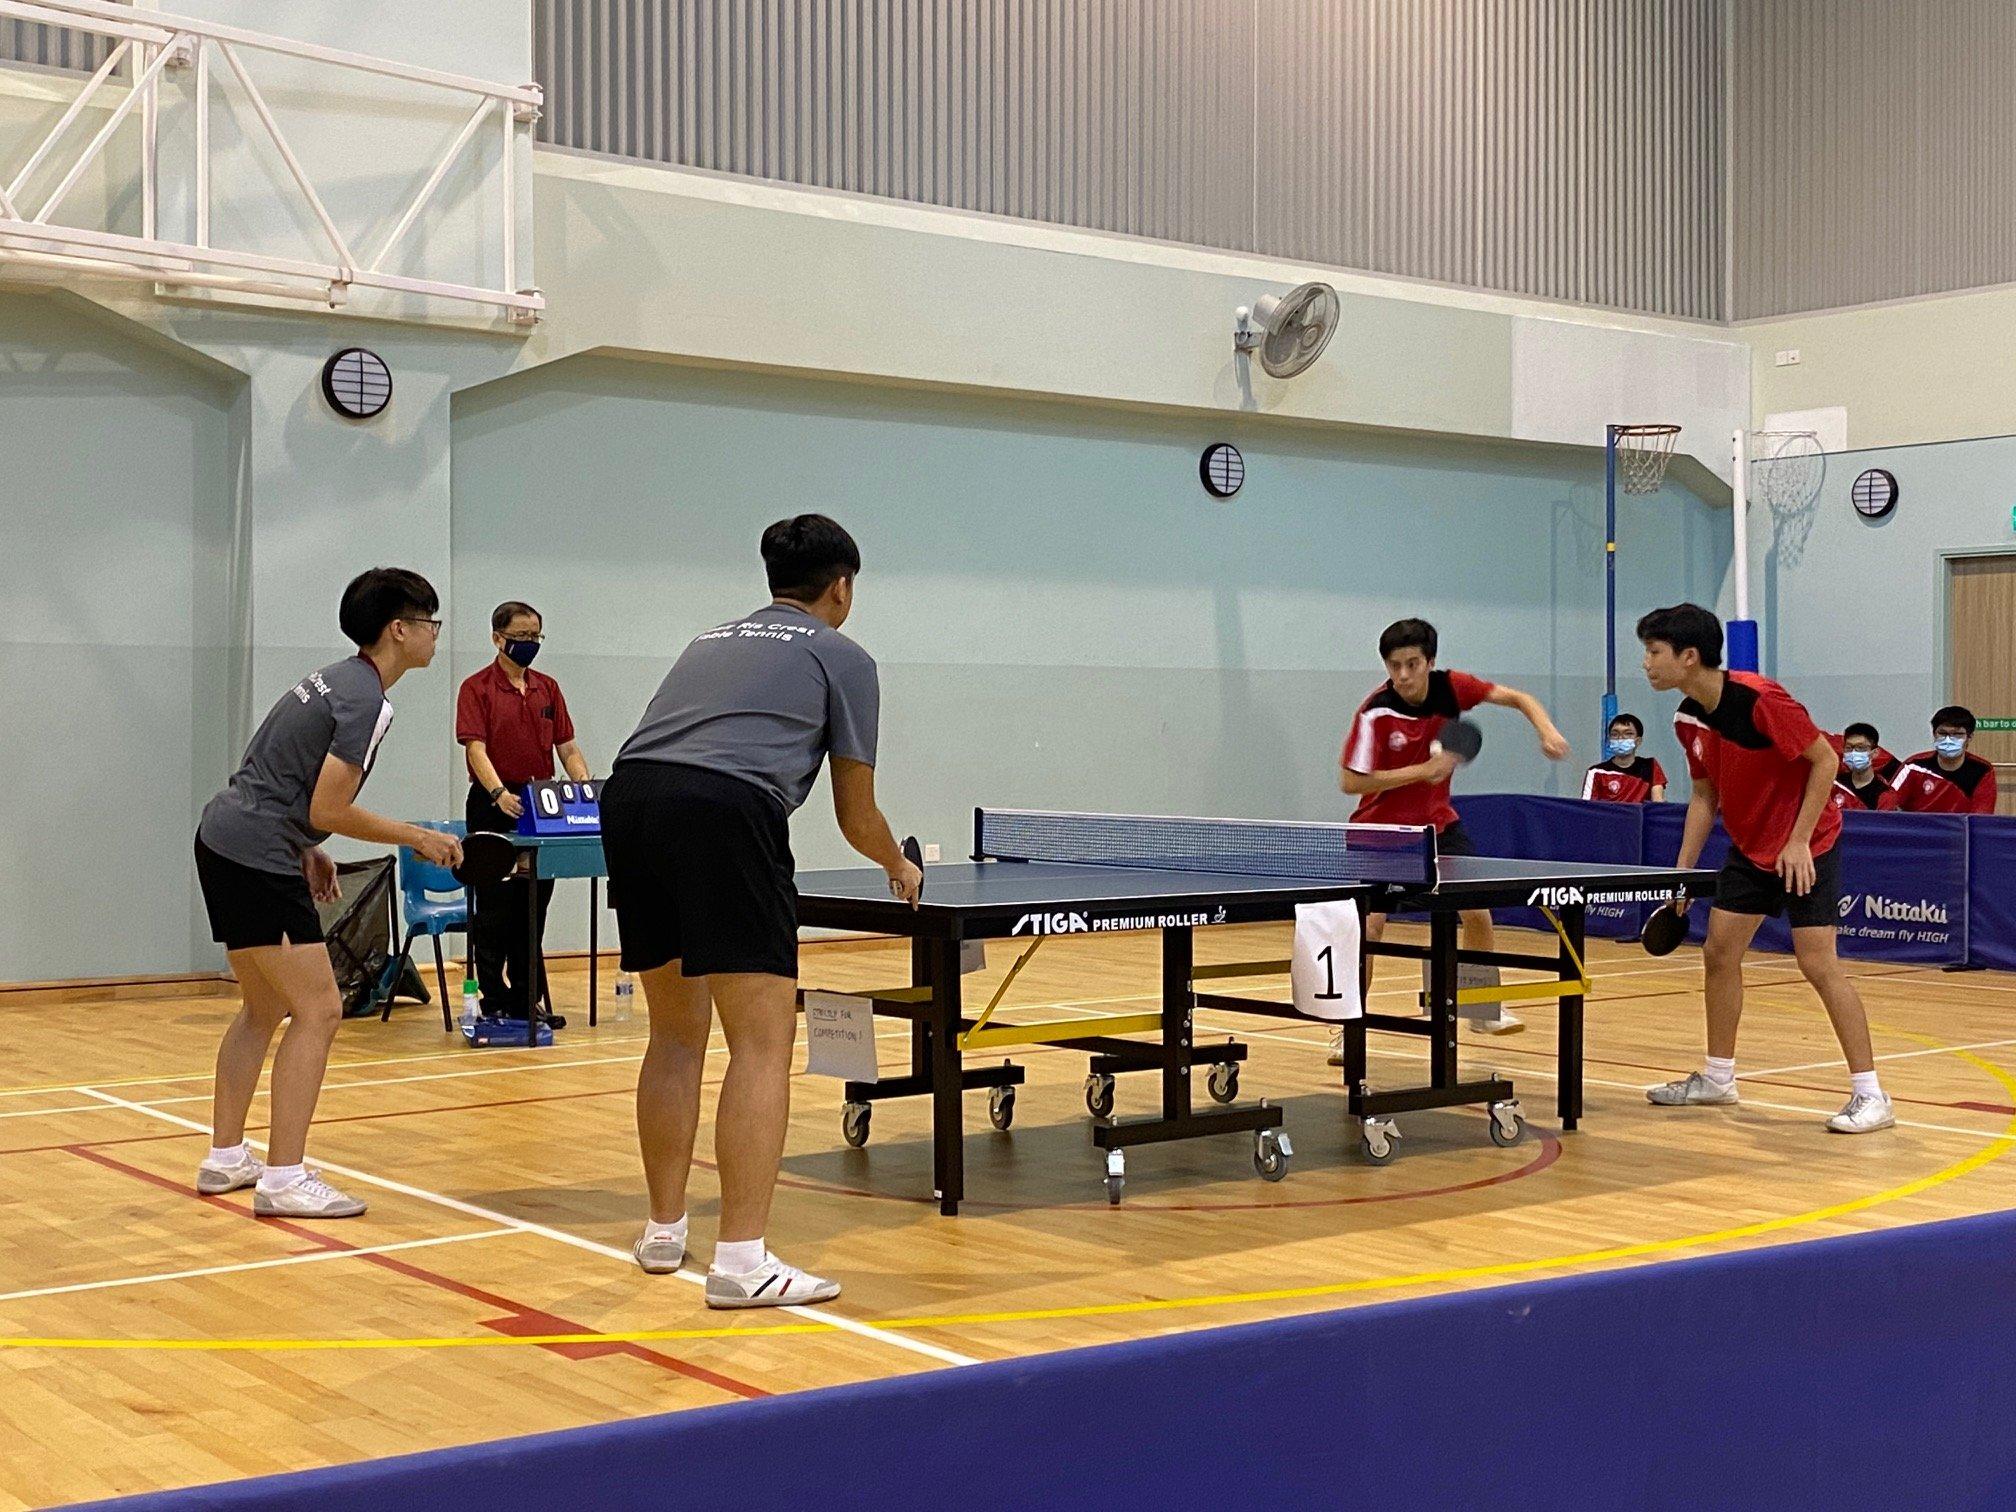 NSG B Div boys table tennis - Pasir Ris Crest (grey) vs Victoria School (red) 1st doubles